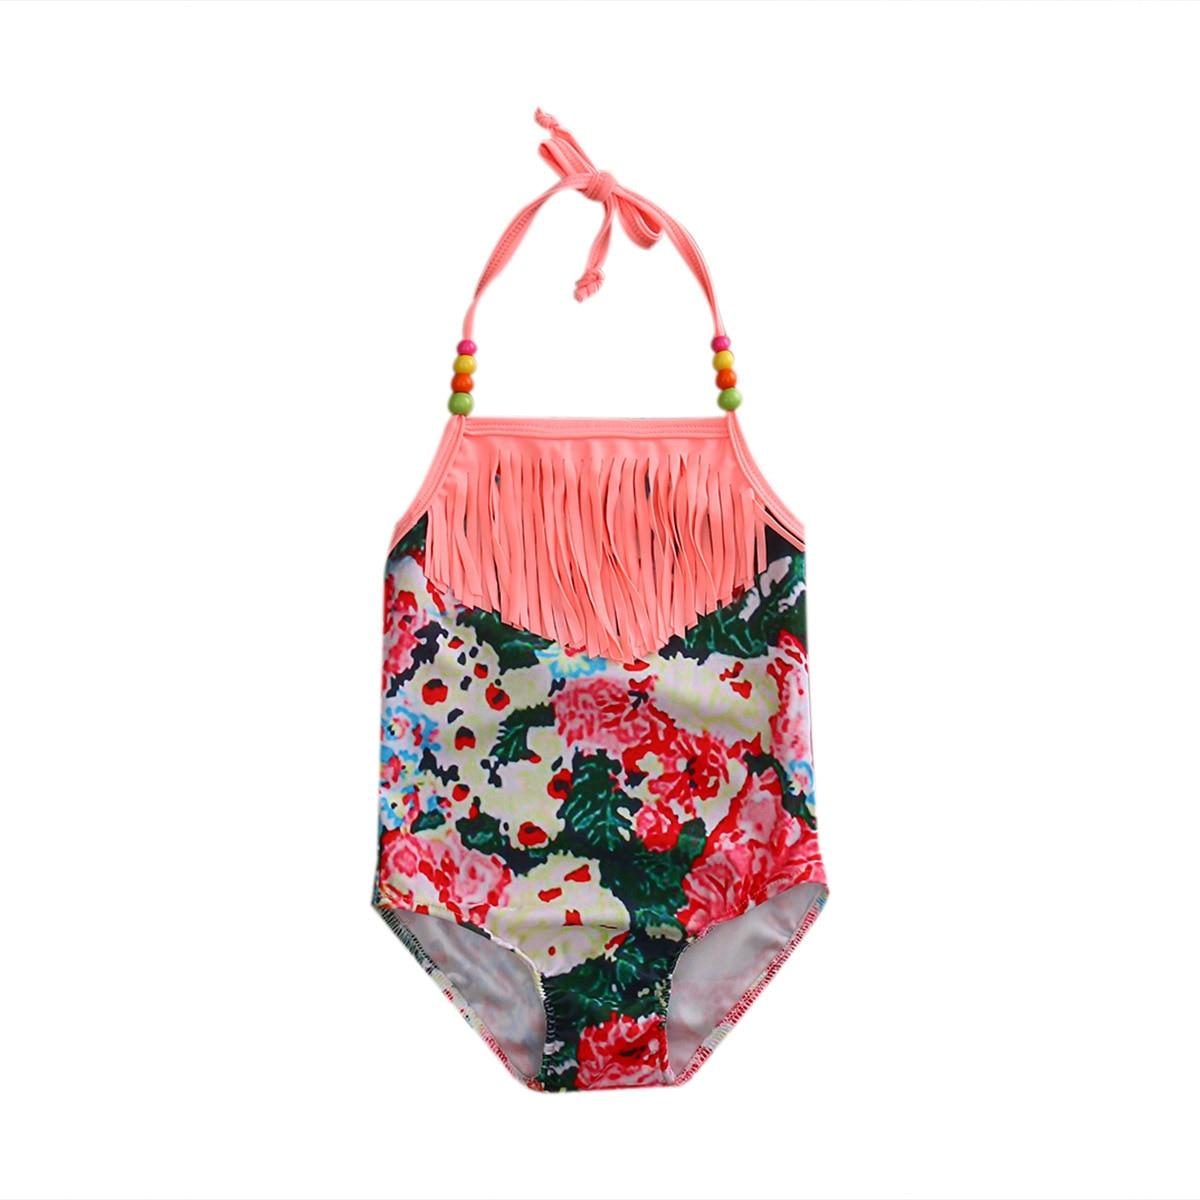 KID'S Swimwear Girls Cute Little Princess Floral-Print One-piece Swimming Suit-Style Tassels Beaded Bracelet Halter Bathing Suit